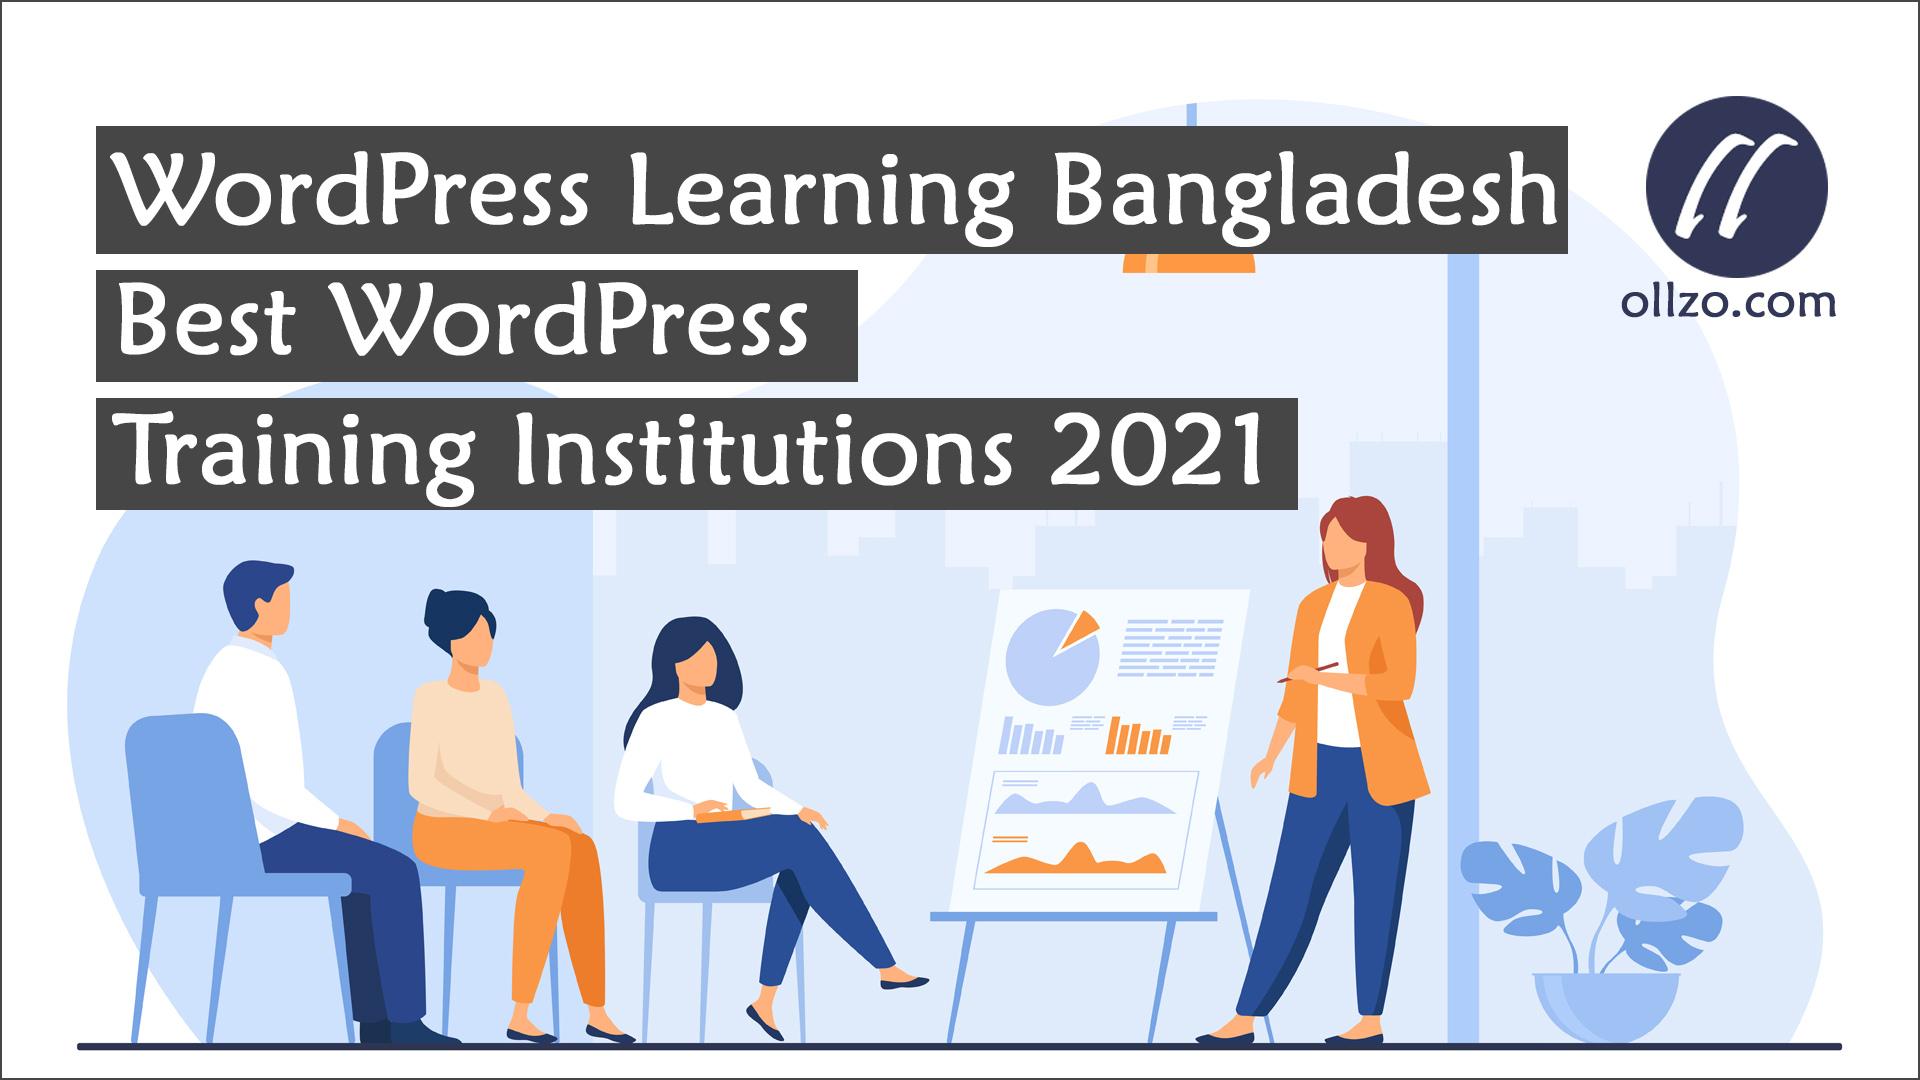 WordPress Learning Bangladesh, Ollzo.com